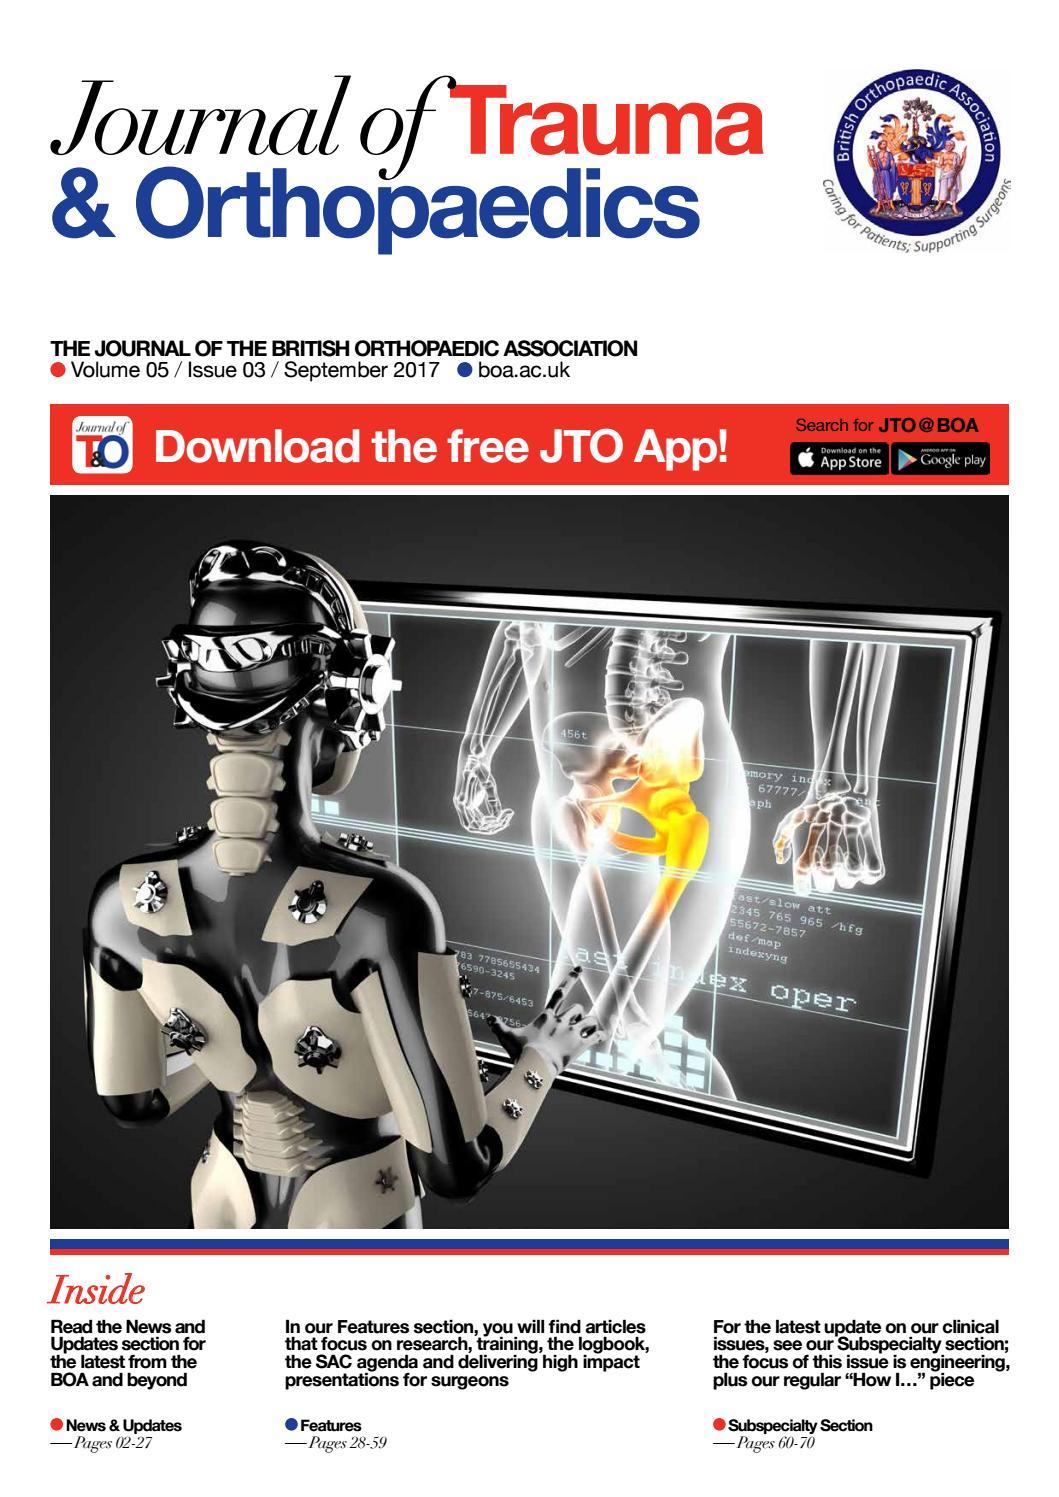 Journal of Trauma & Orthopaedics – Vol 5 / Iss 3 by British